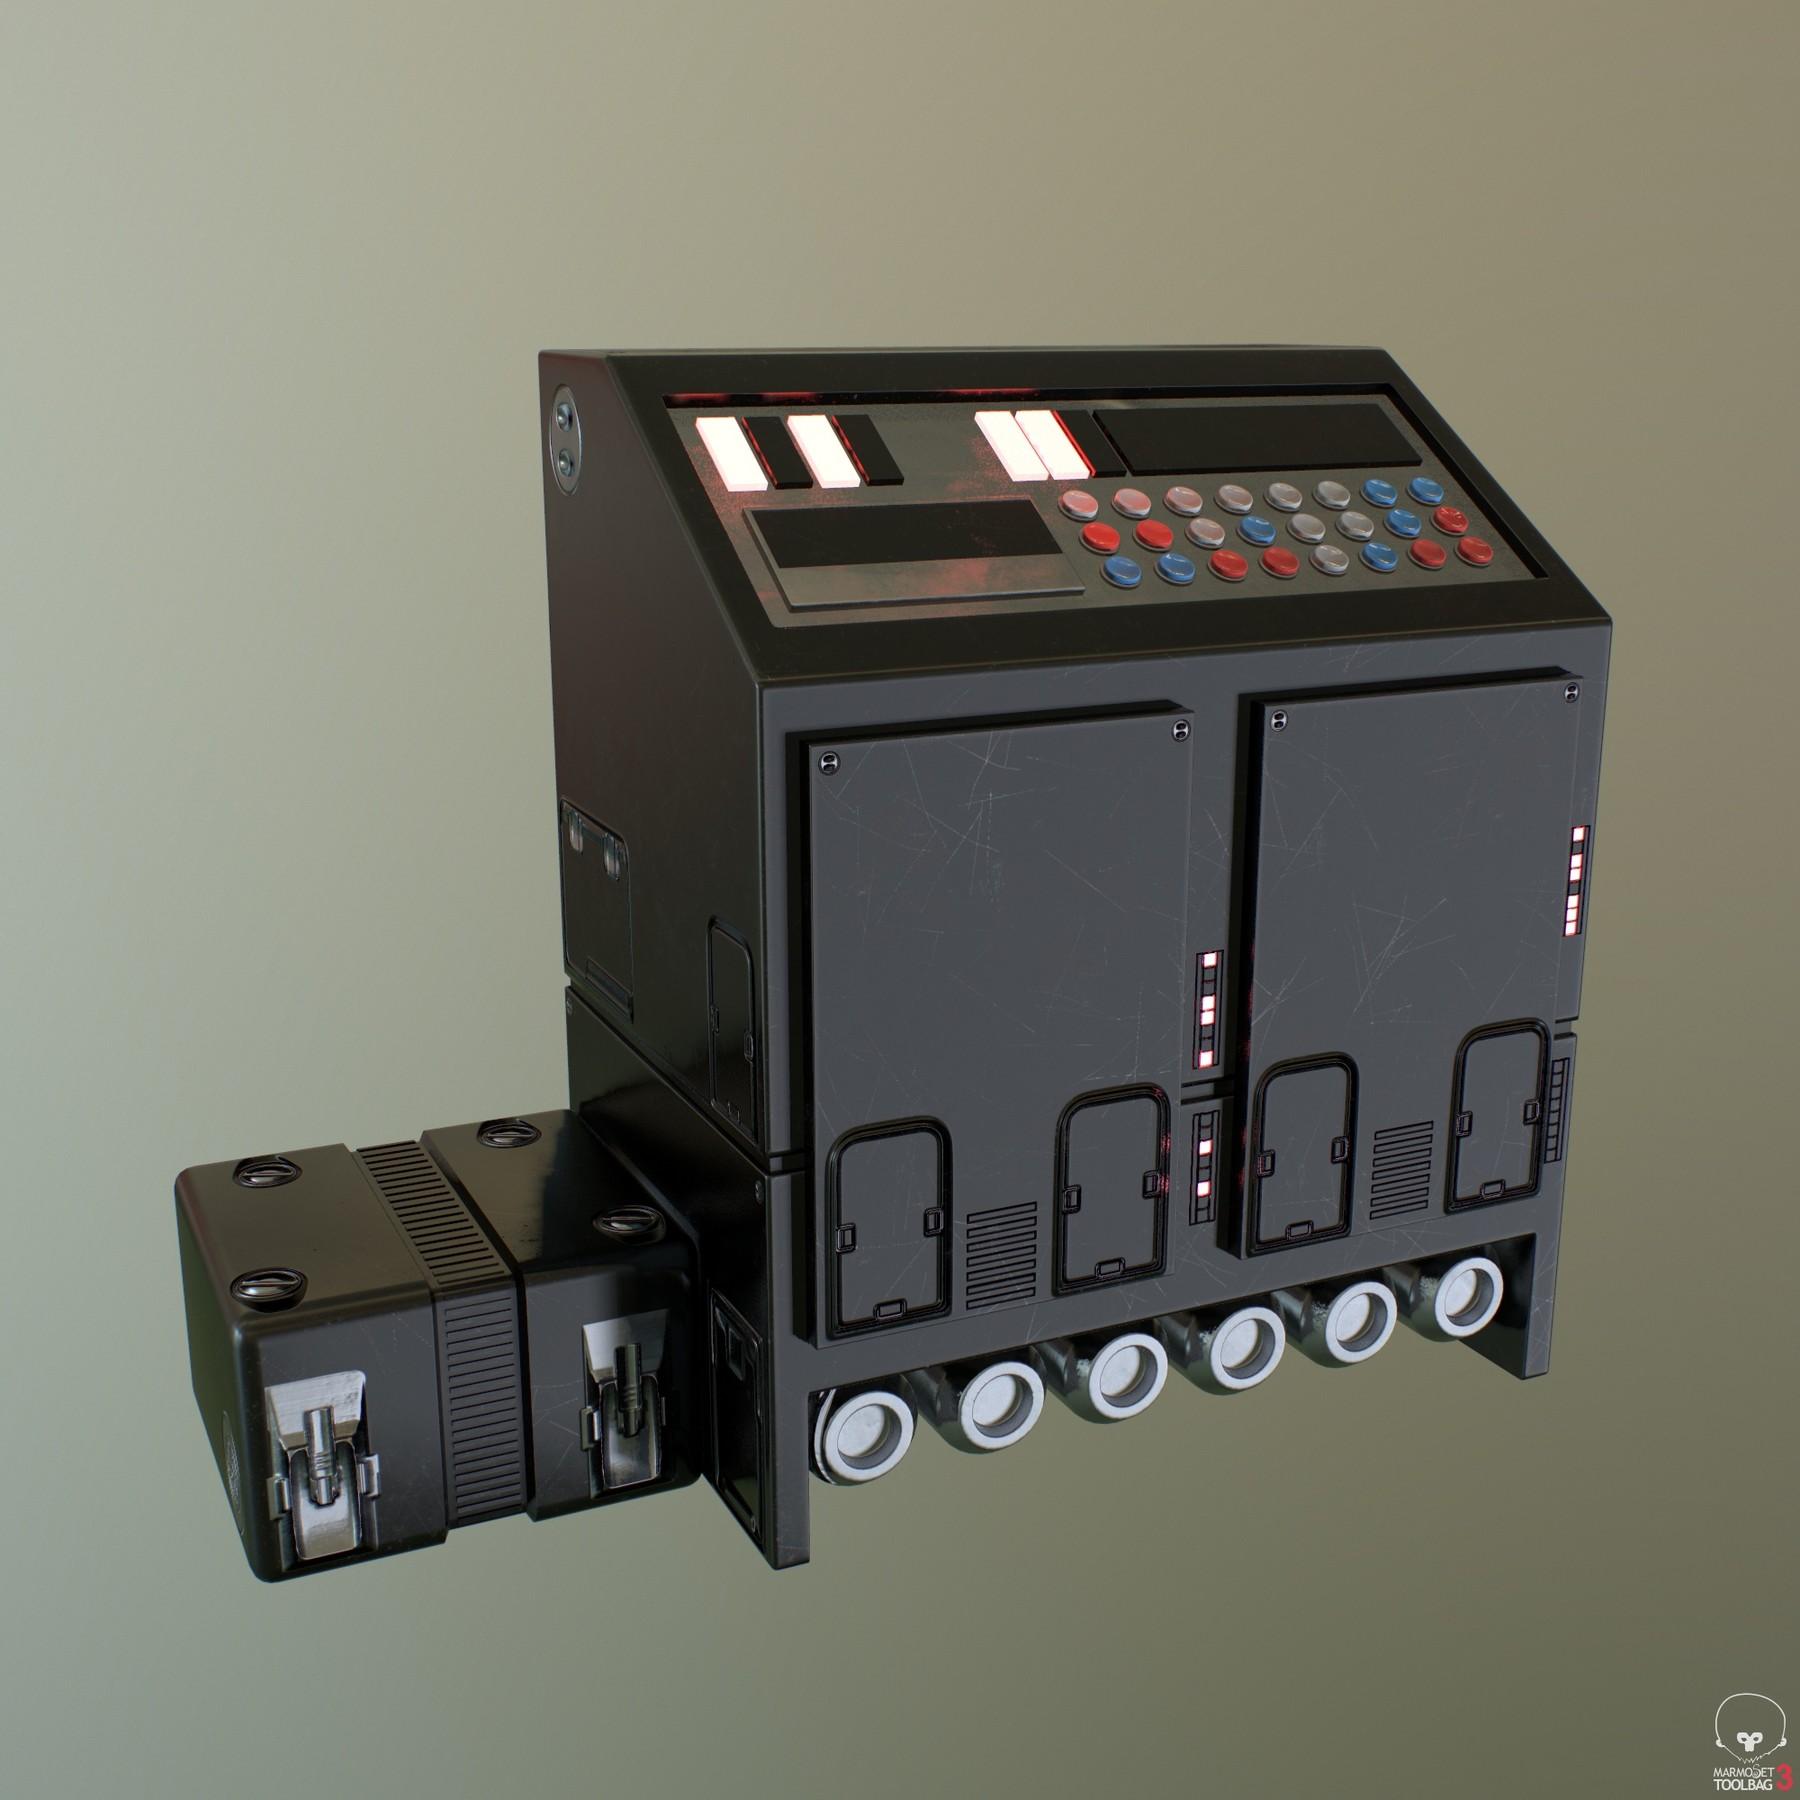 Console marmoset